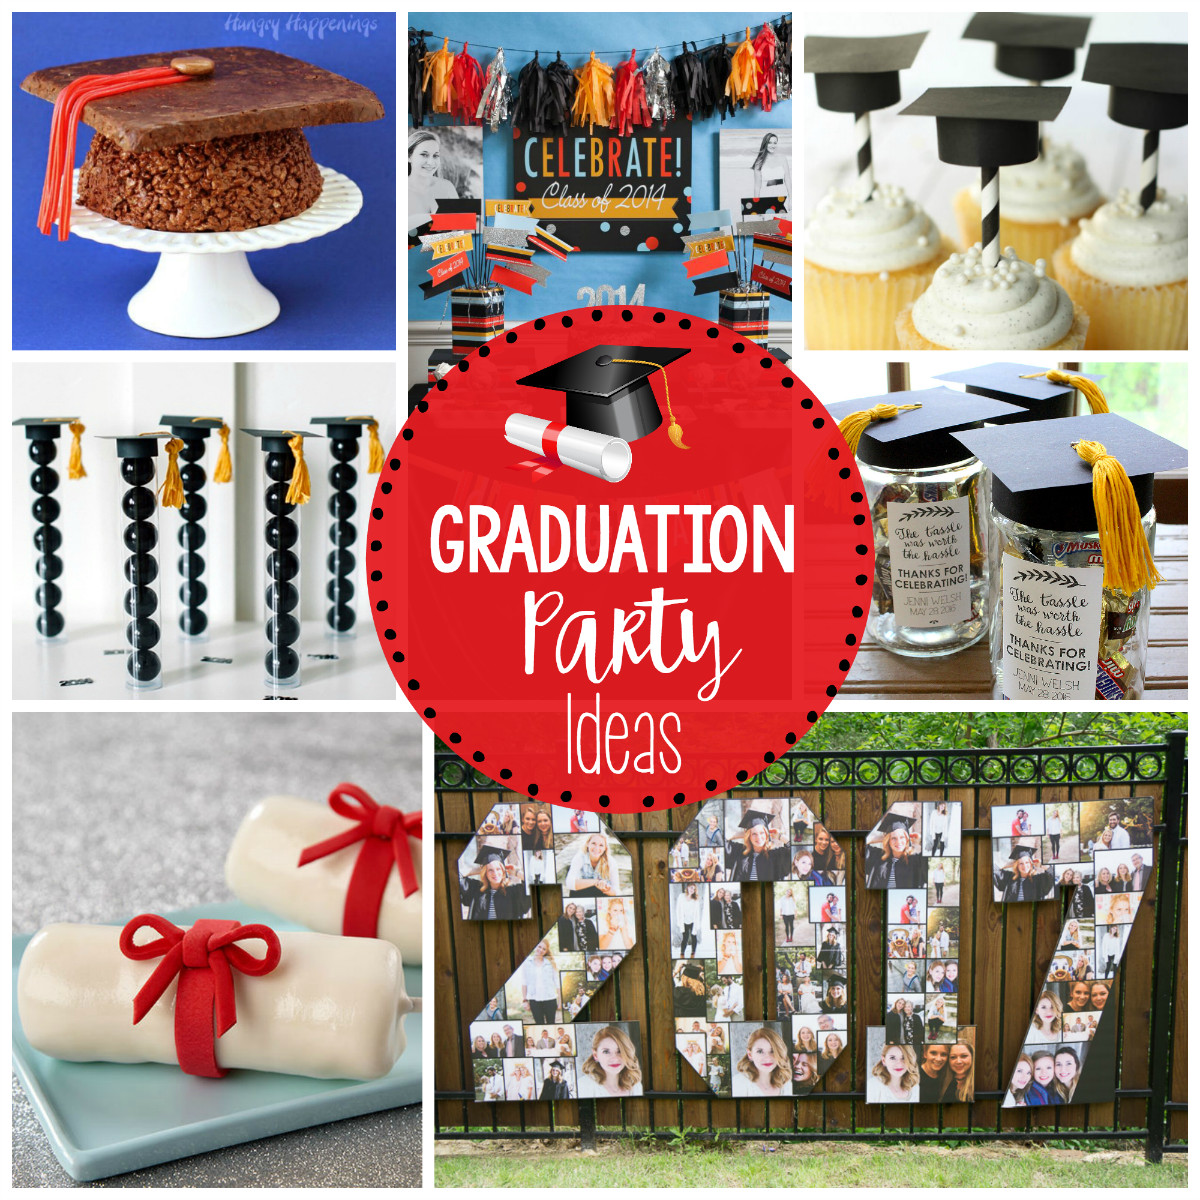 Graduation Dinner Party Ideas  25 Fun Graduation Party Ideas – Fun Squared